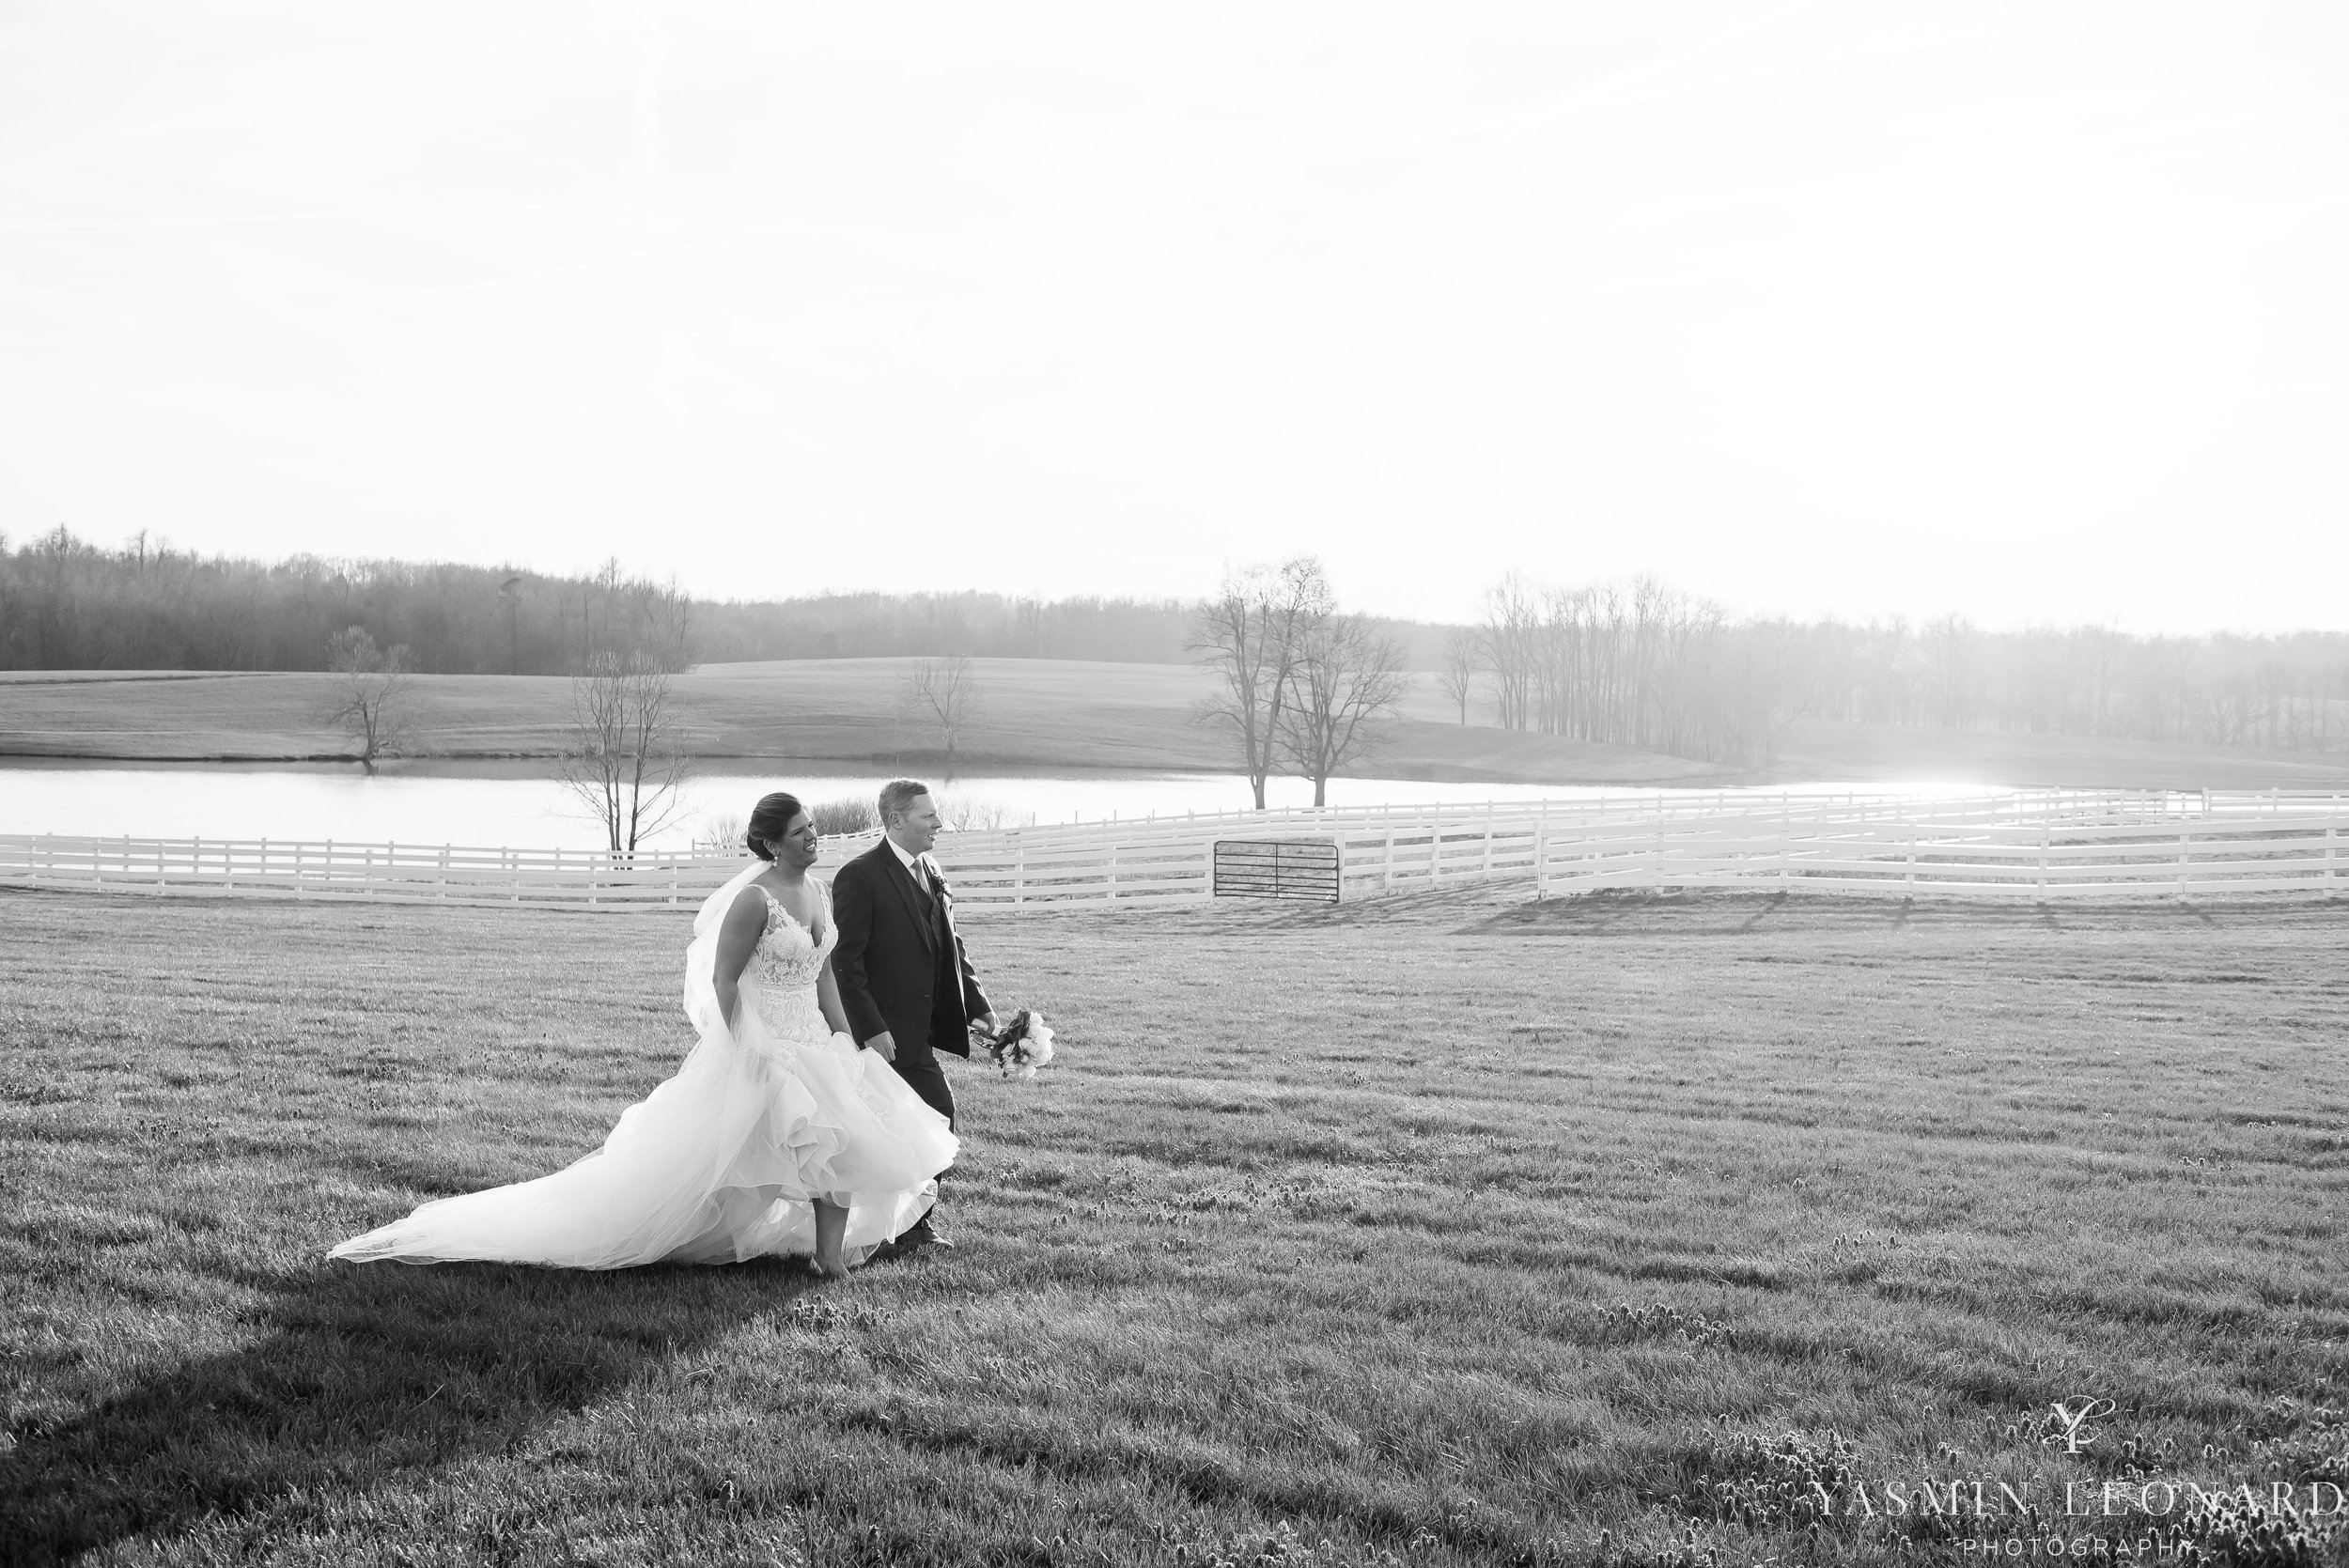 Adaumont Farm - Adaumont Farm Weddings - Trinity Weddings - NC Weddings - Yasmin Leonard Photography-53.jpg